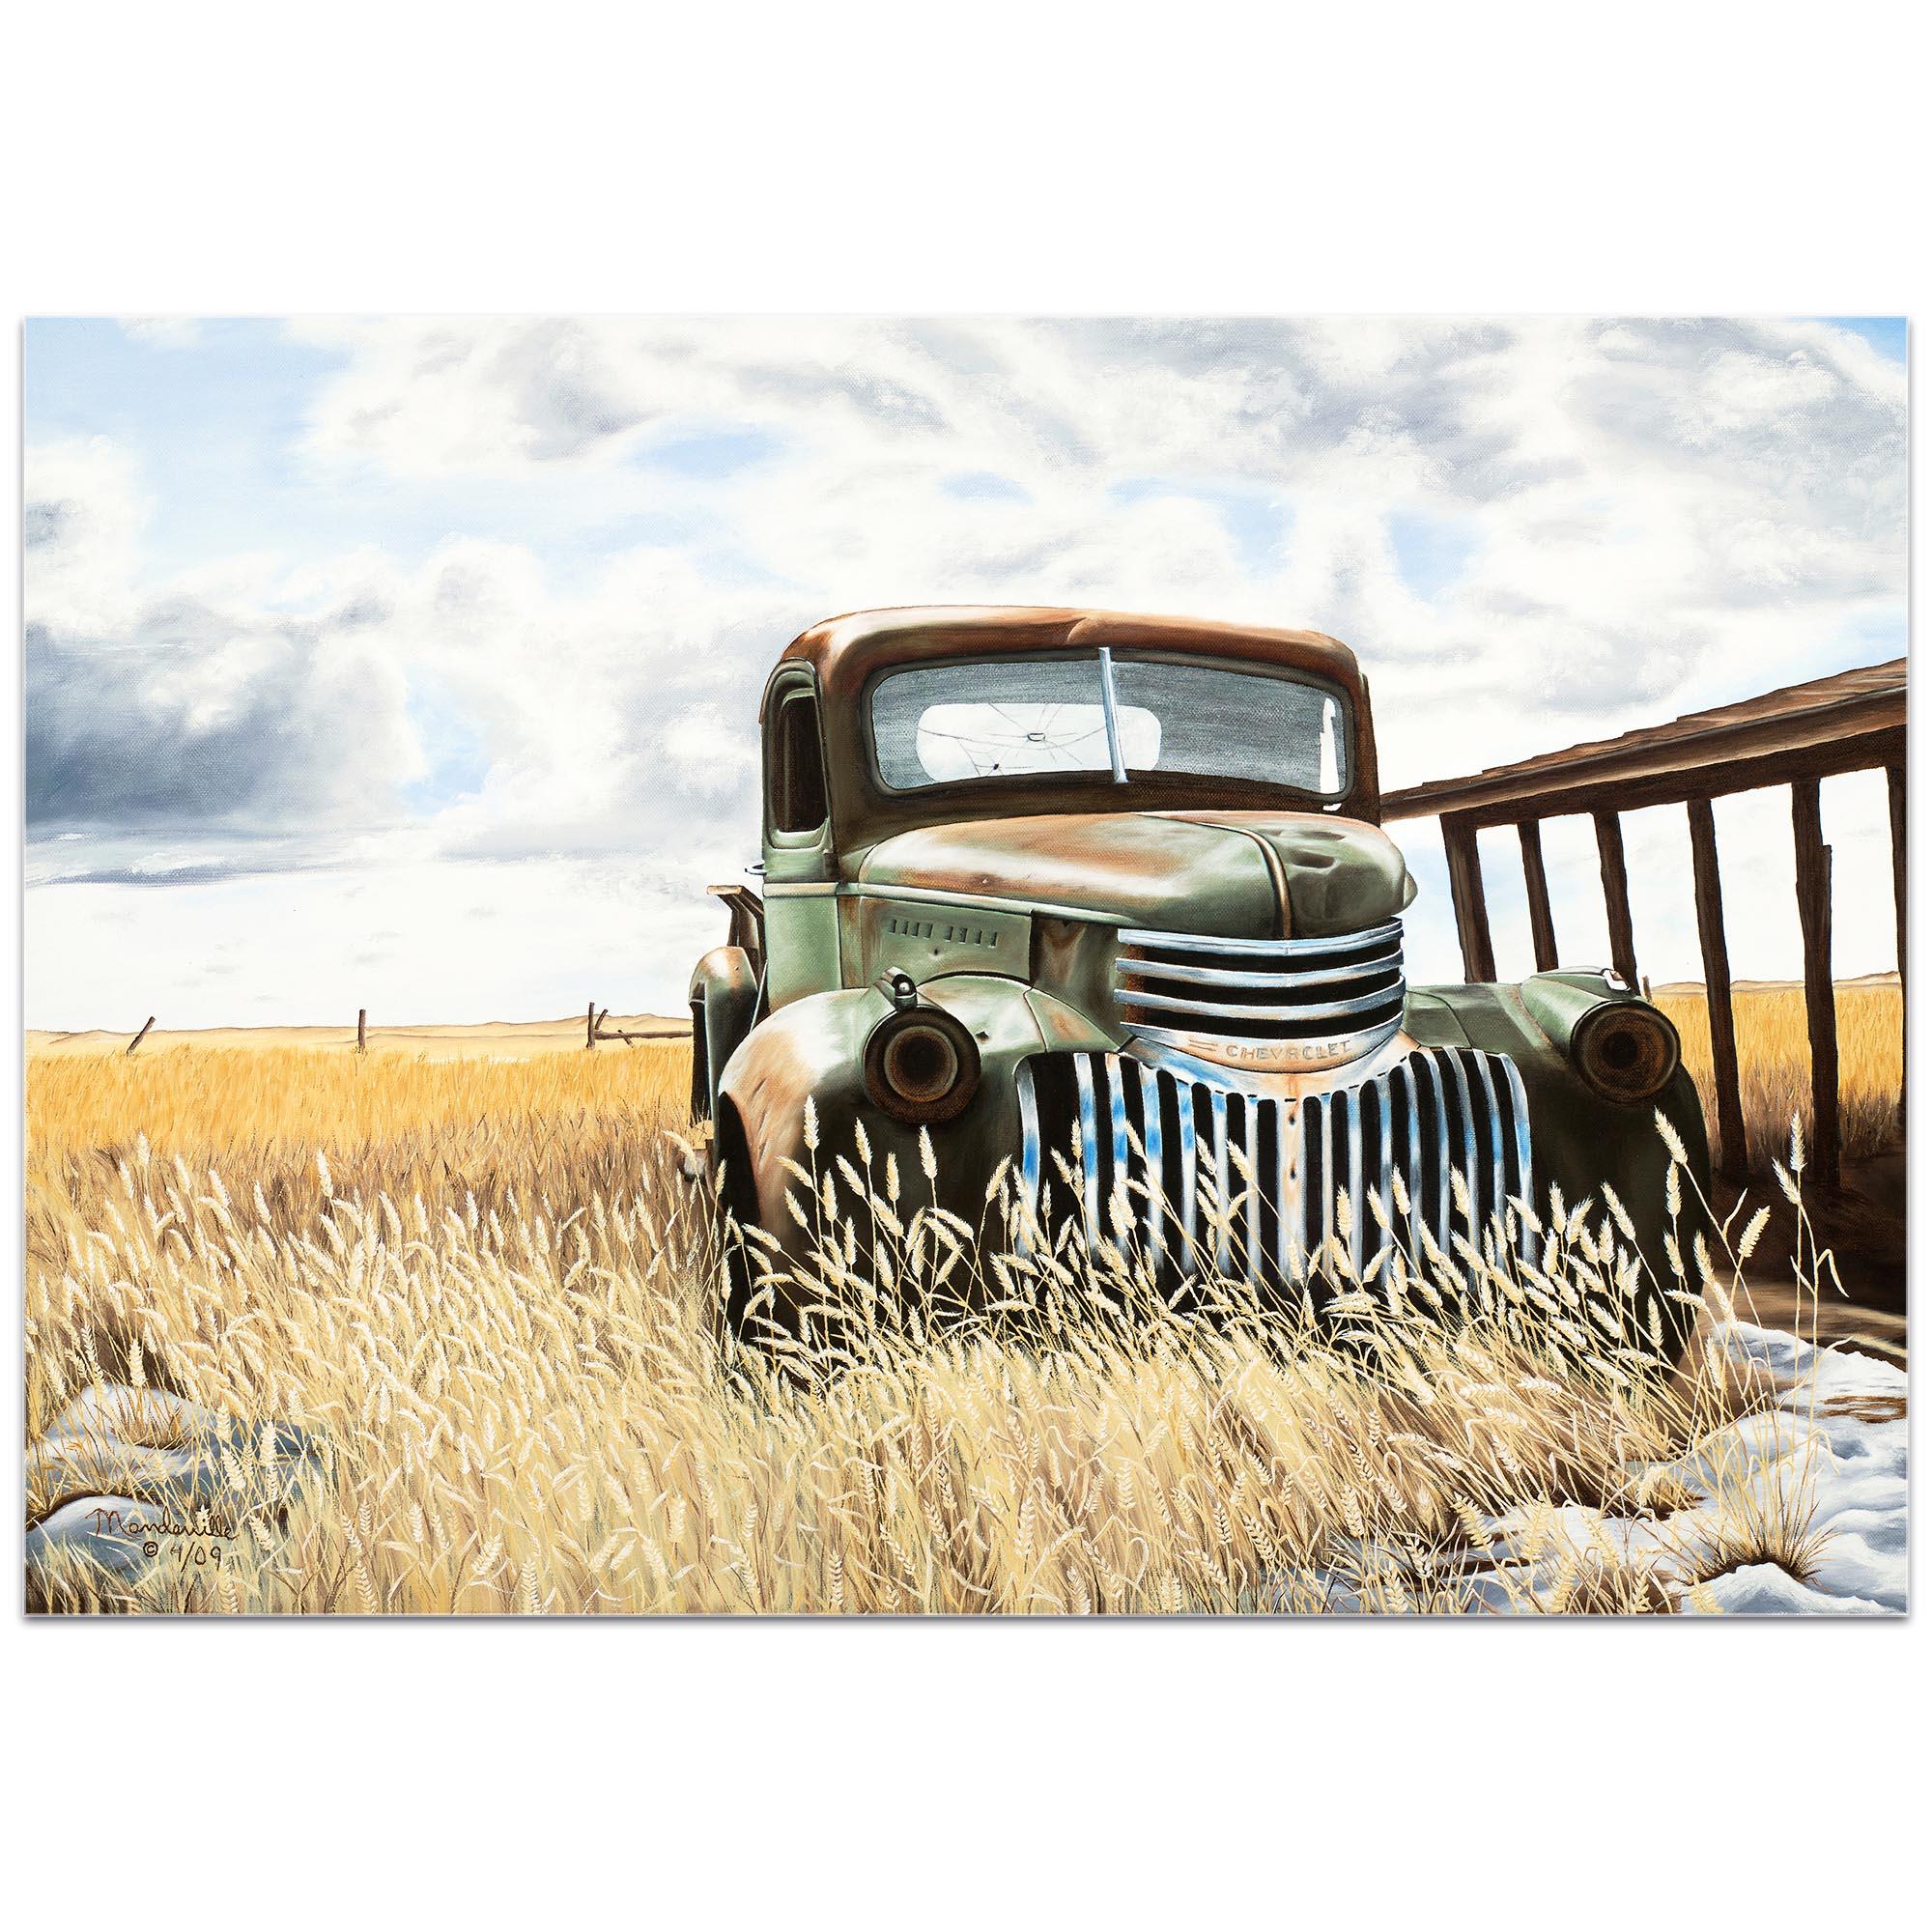 Americana Wall Art 'Swede's Old Truck' - Classic Trucks Decor on Metal or Plexiglass - Image 2